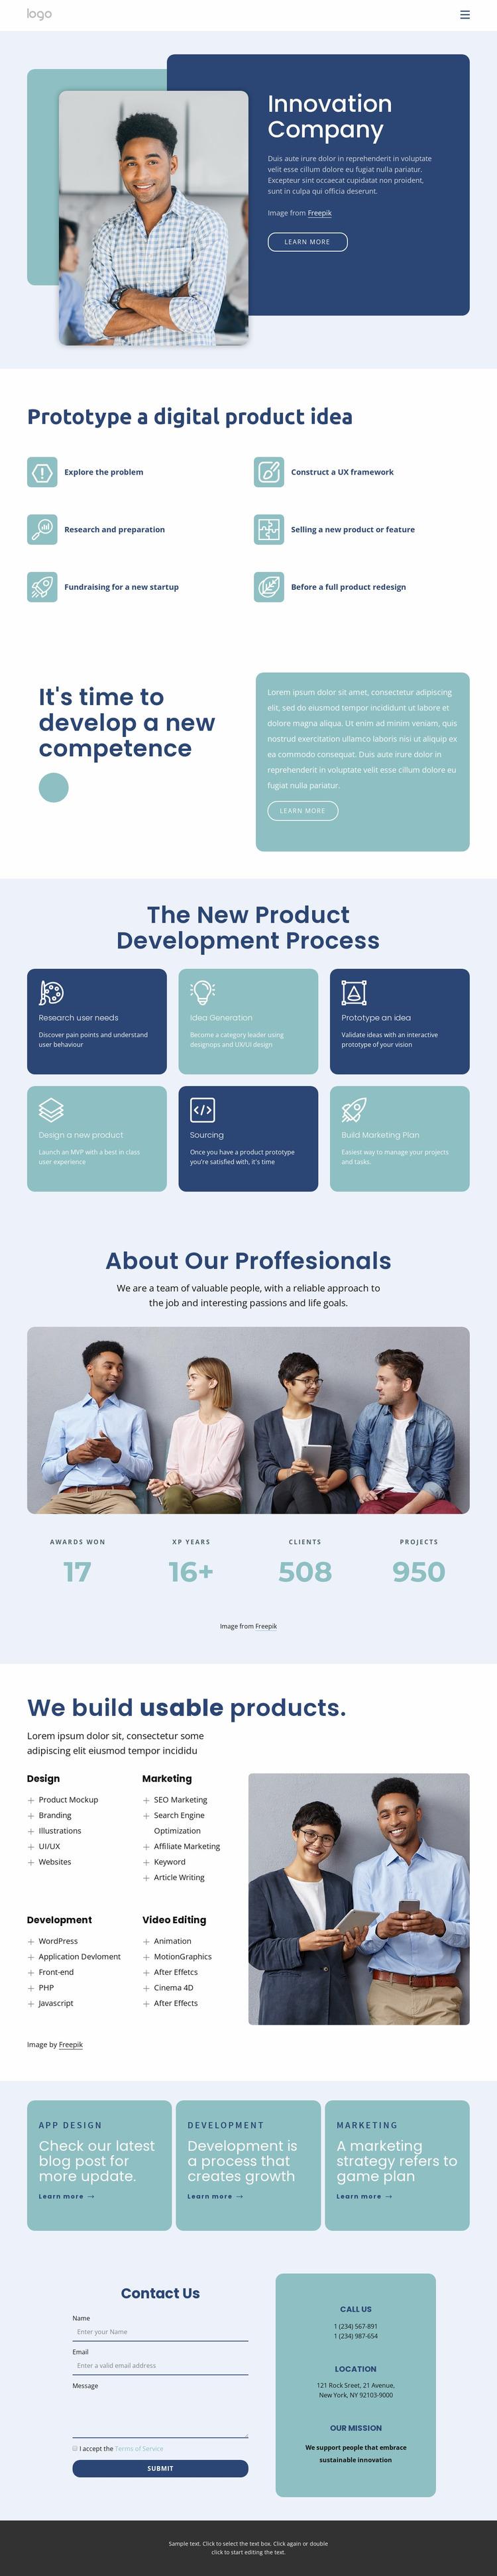 Innovation company Website Mockup